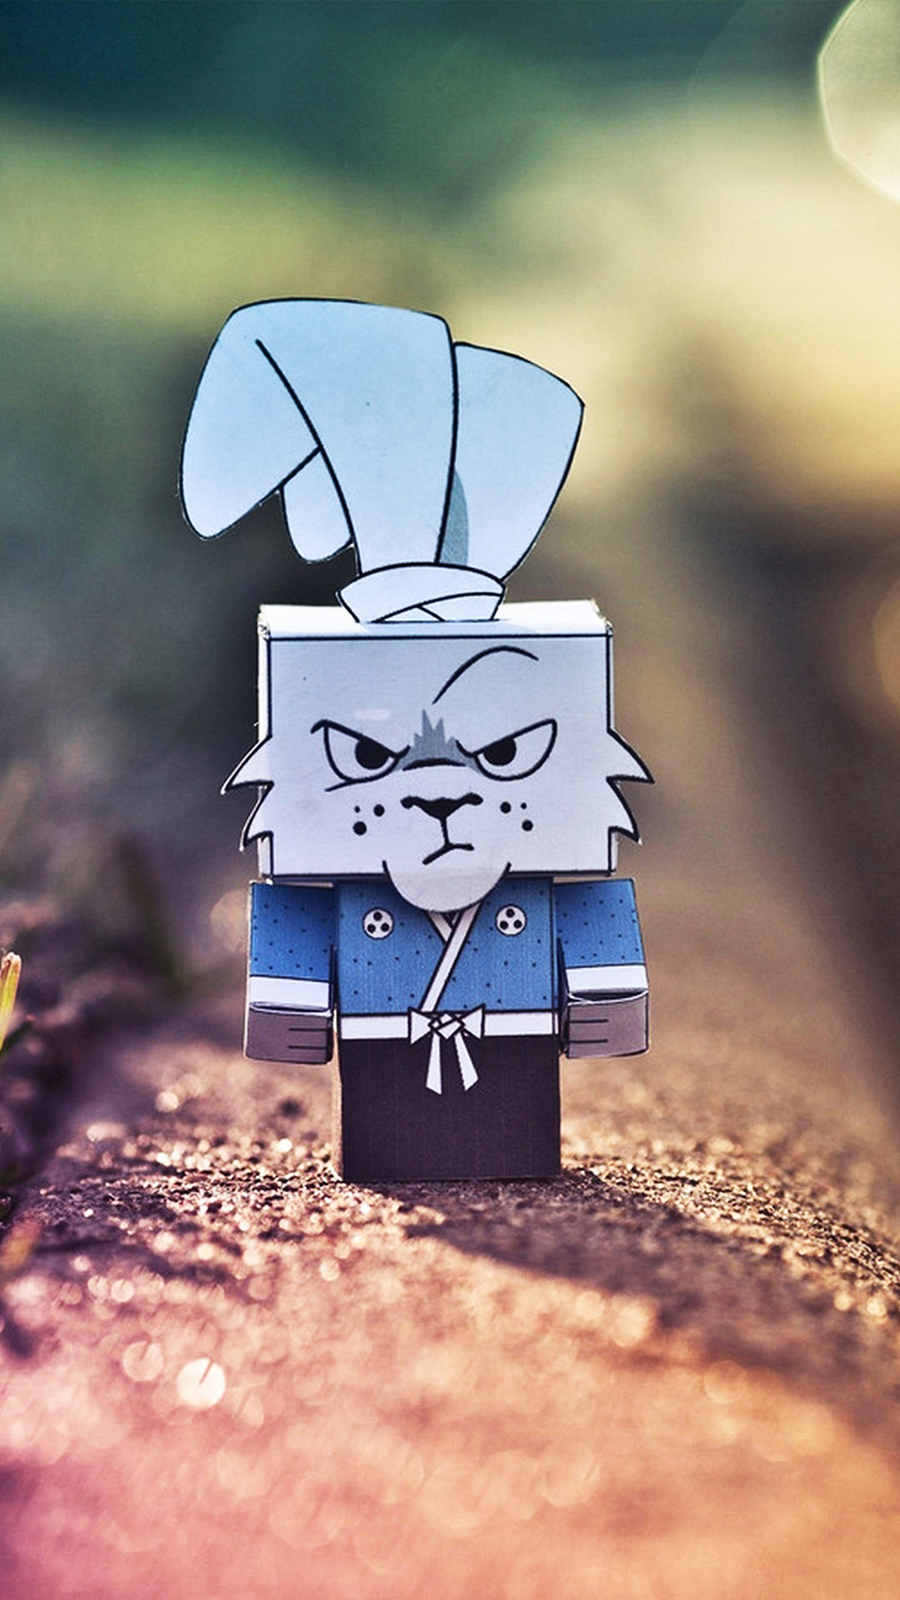 Cute Grumpy Cardboard Rabbit 4K Wallpapers Free Download